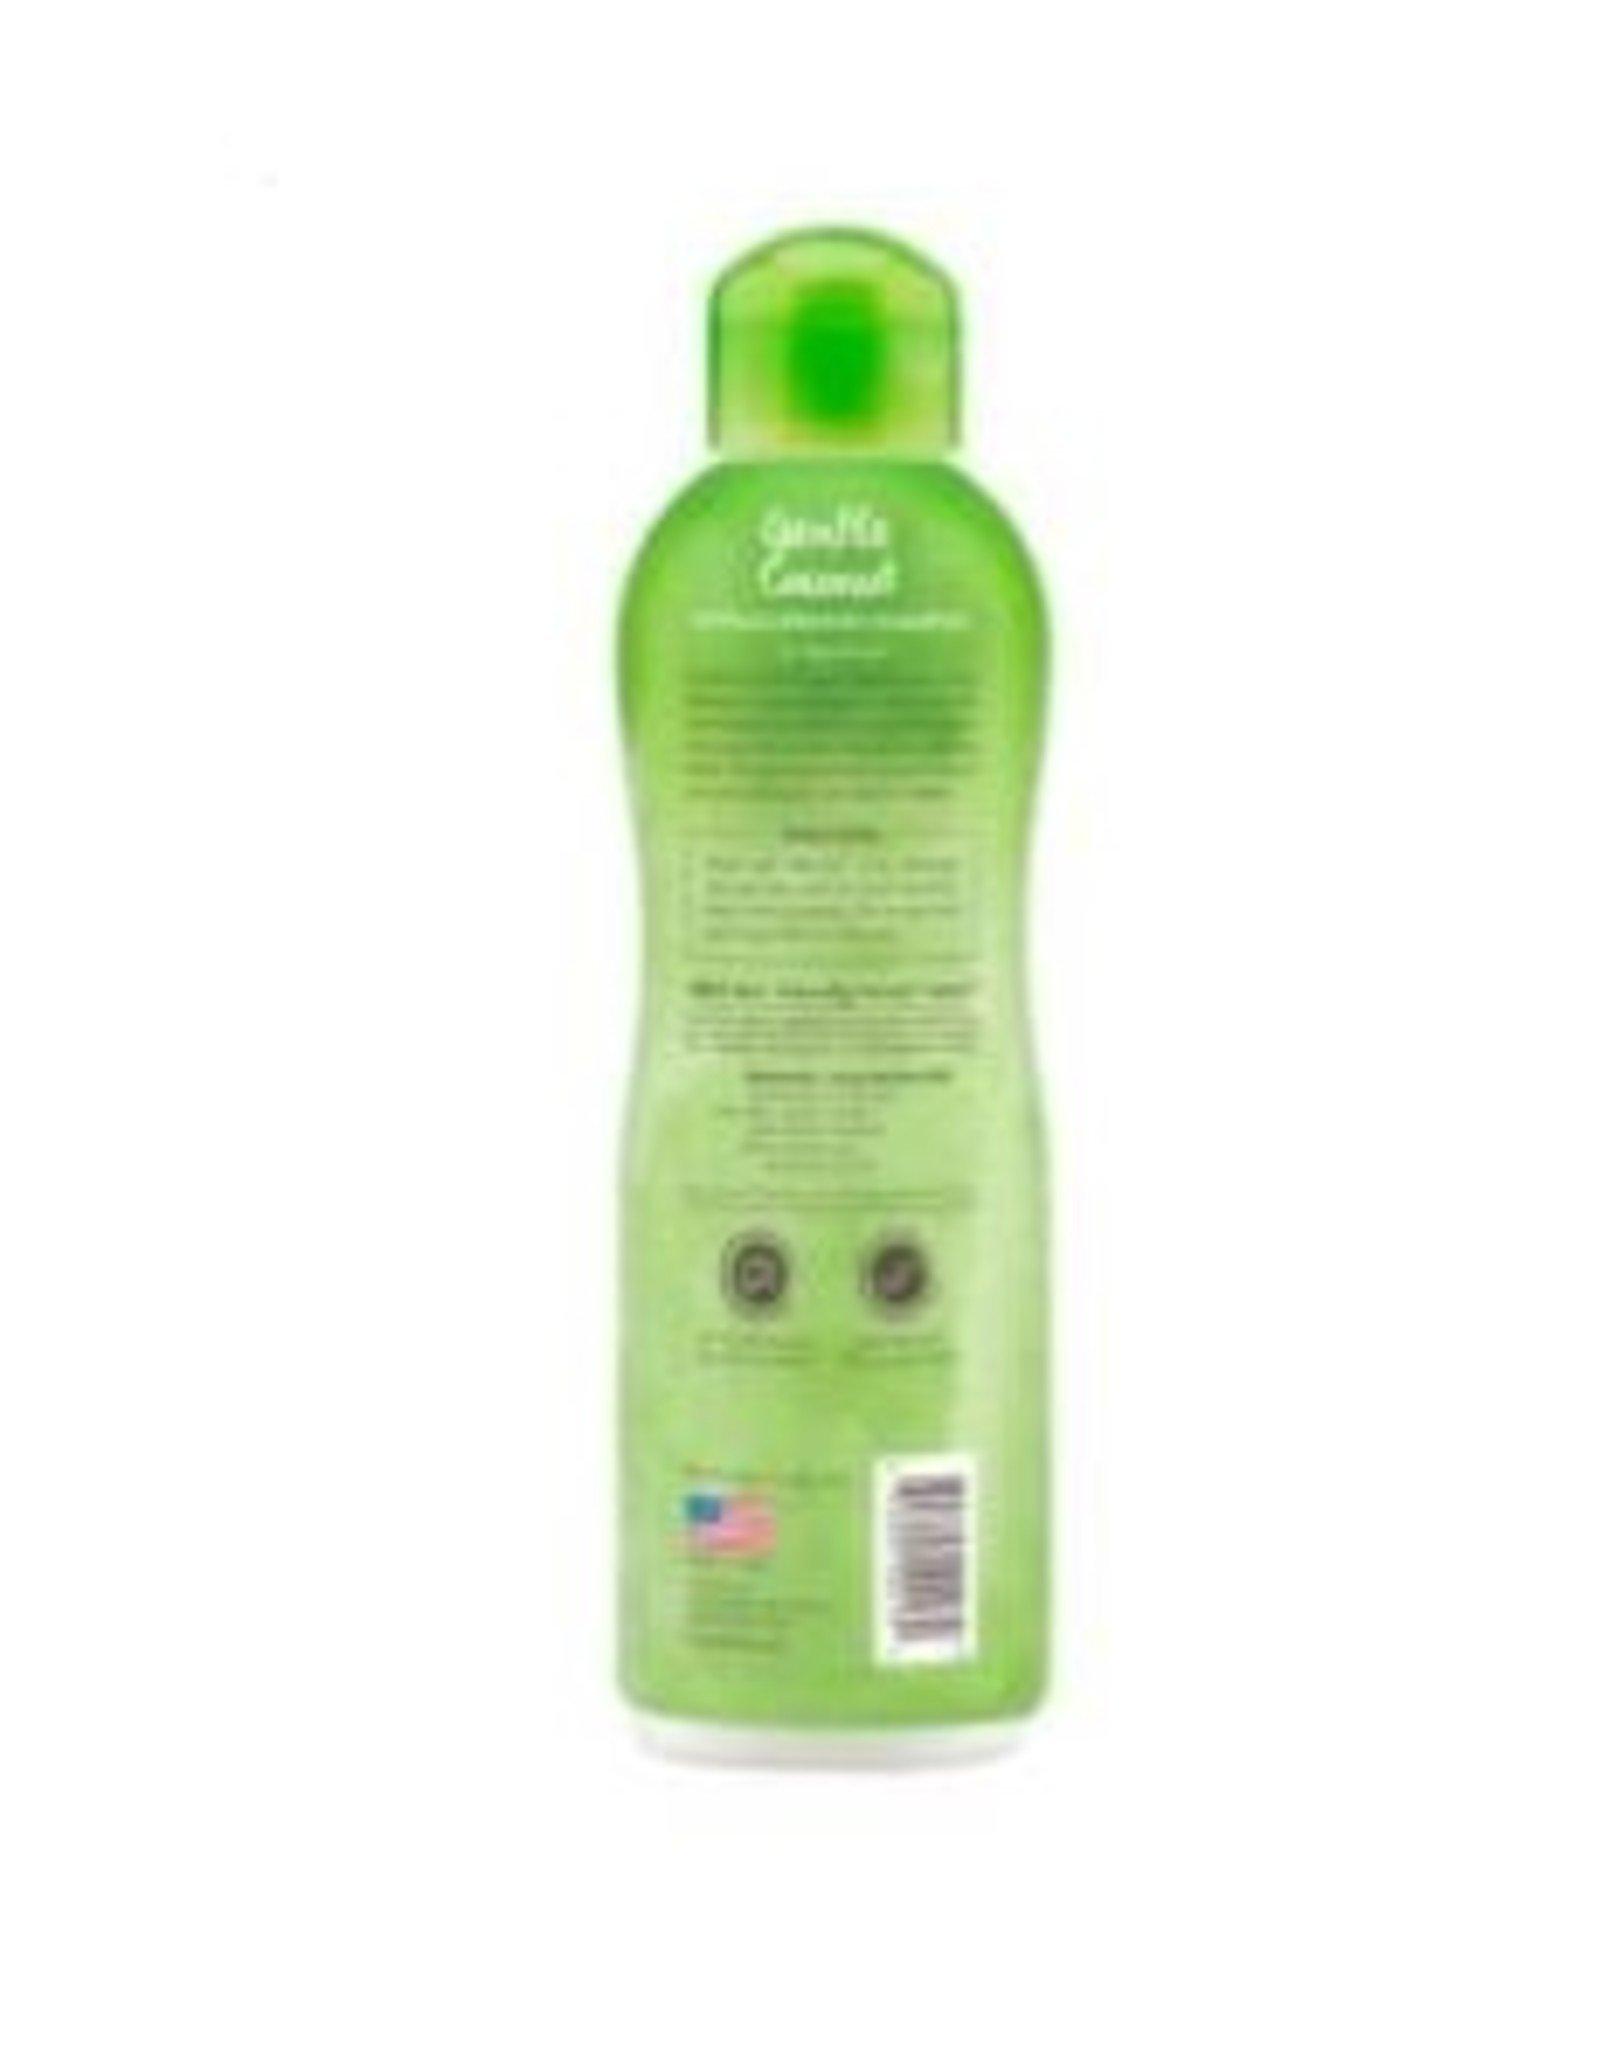 TropiClean Gentle Coconut Hypo Allergenic Puppy & Kitten Shampoo, 20oz